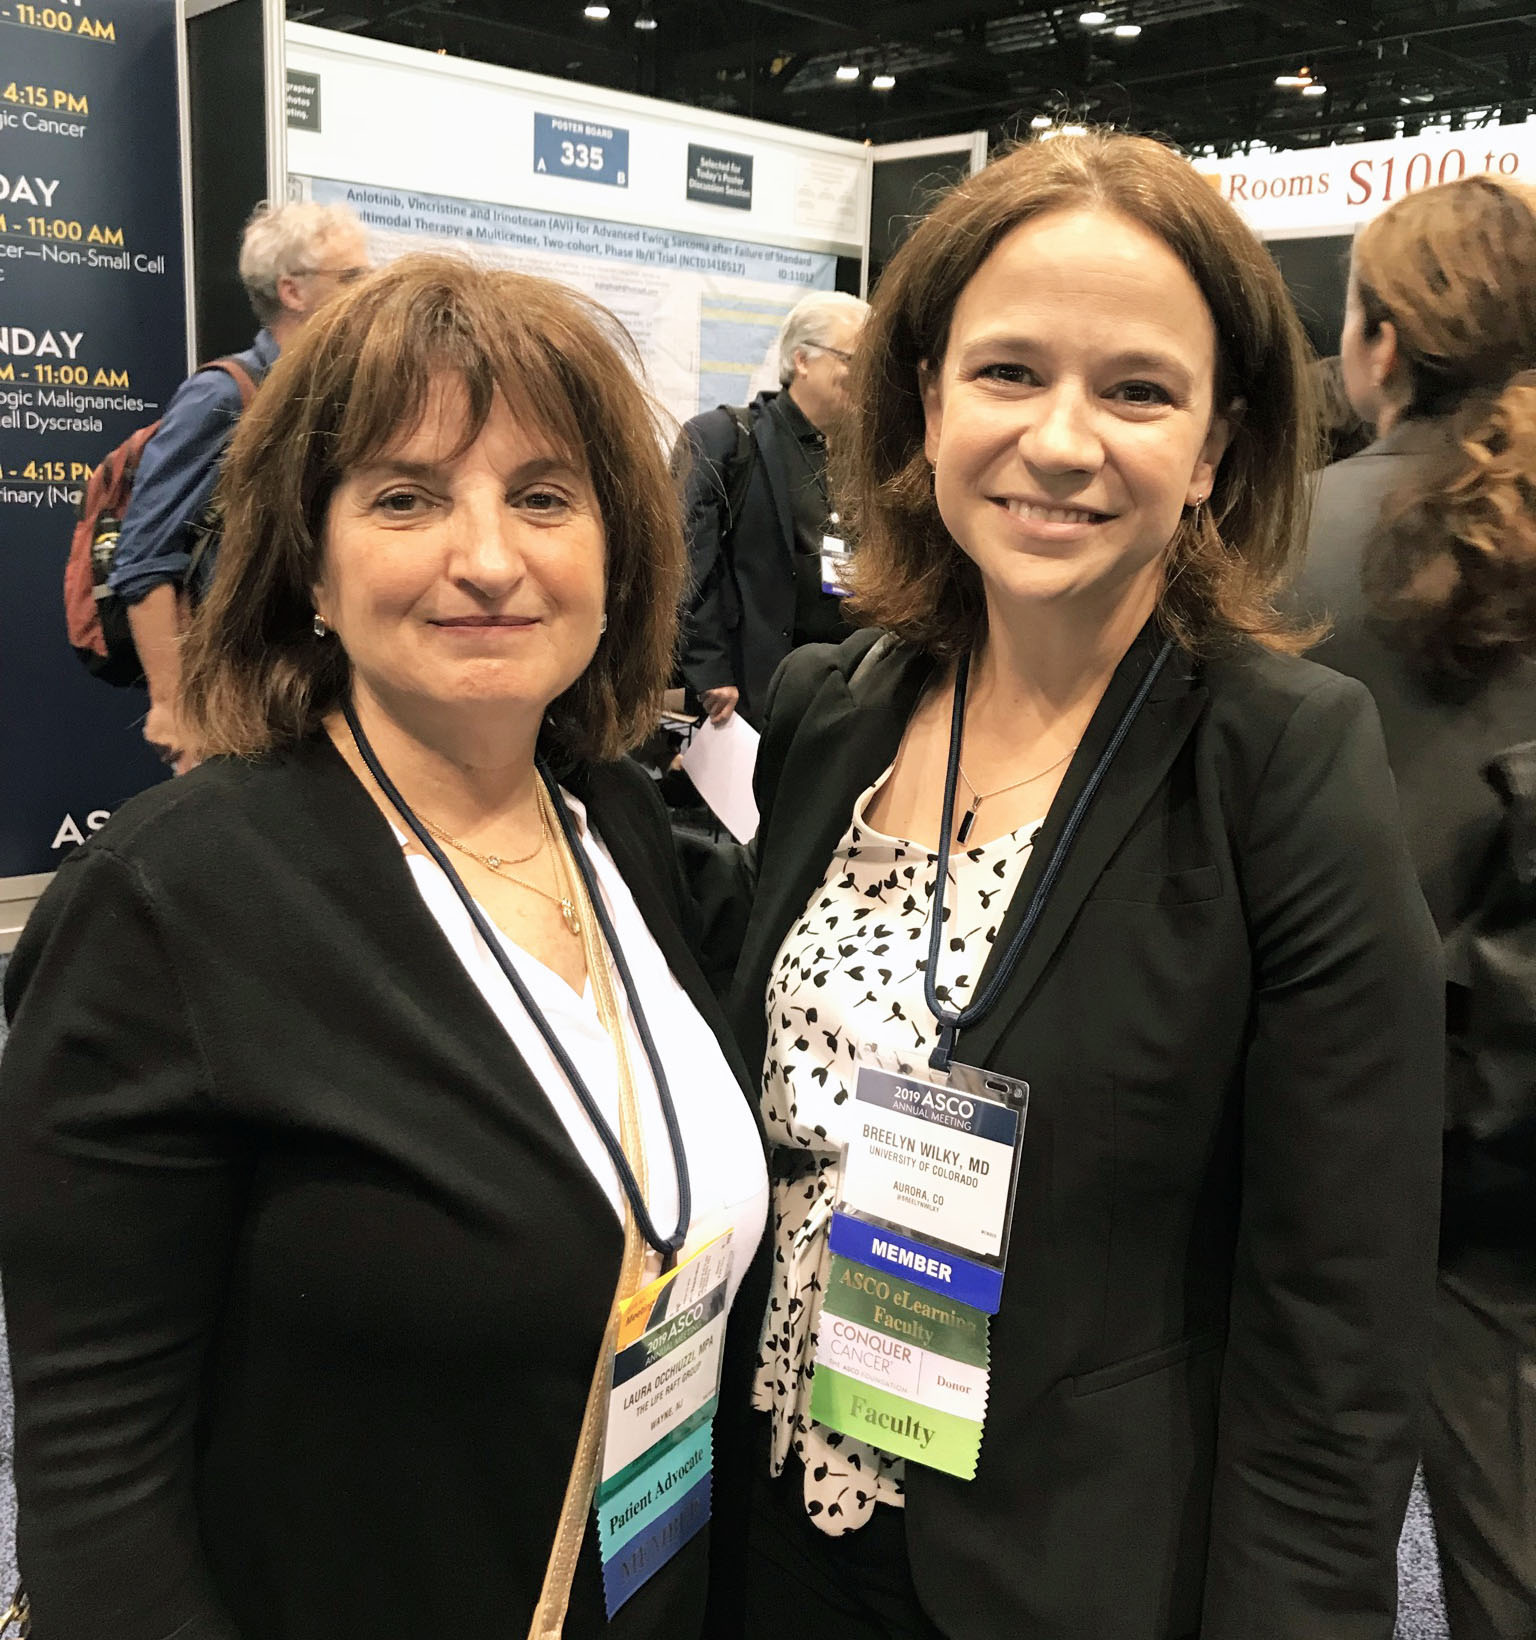 Laura Occhiuzzi and Breelyn Wilky